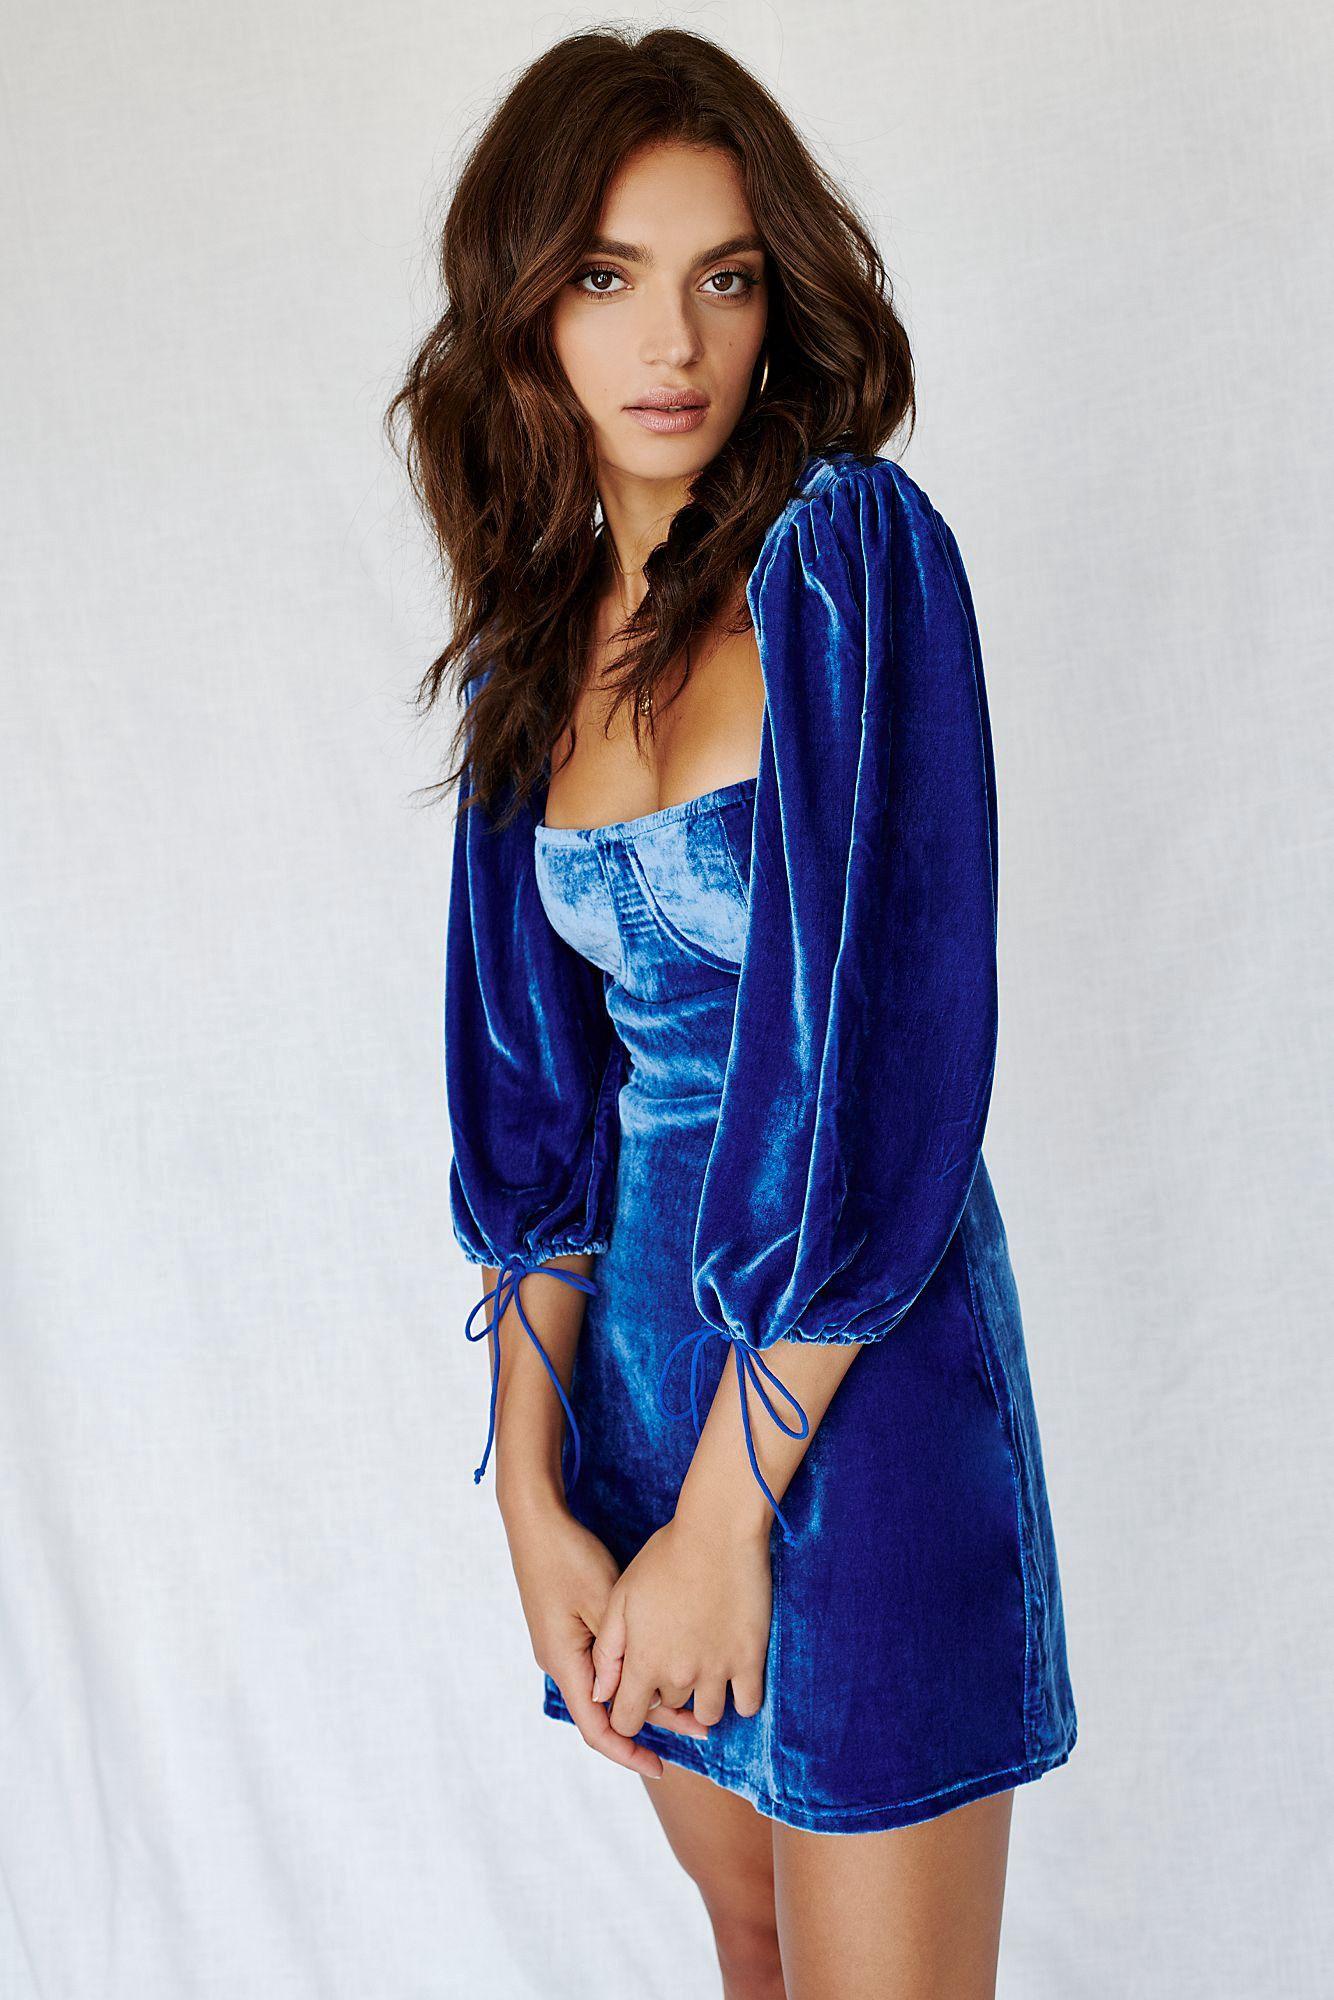 c09baa8aceb Free People Nadine Velvet Bustier Mini Dress - Rust Xs in 2019 ...